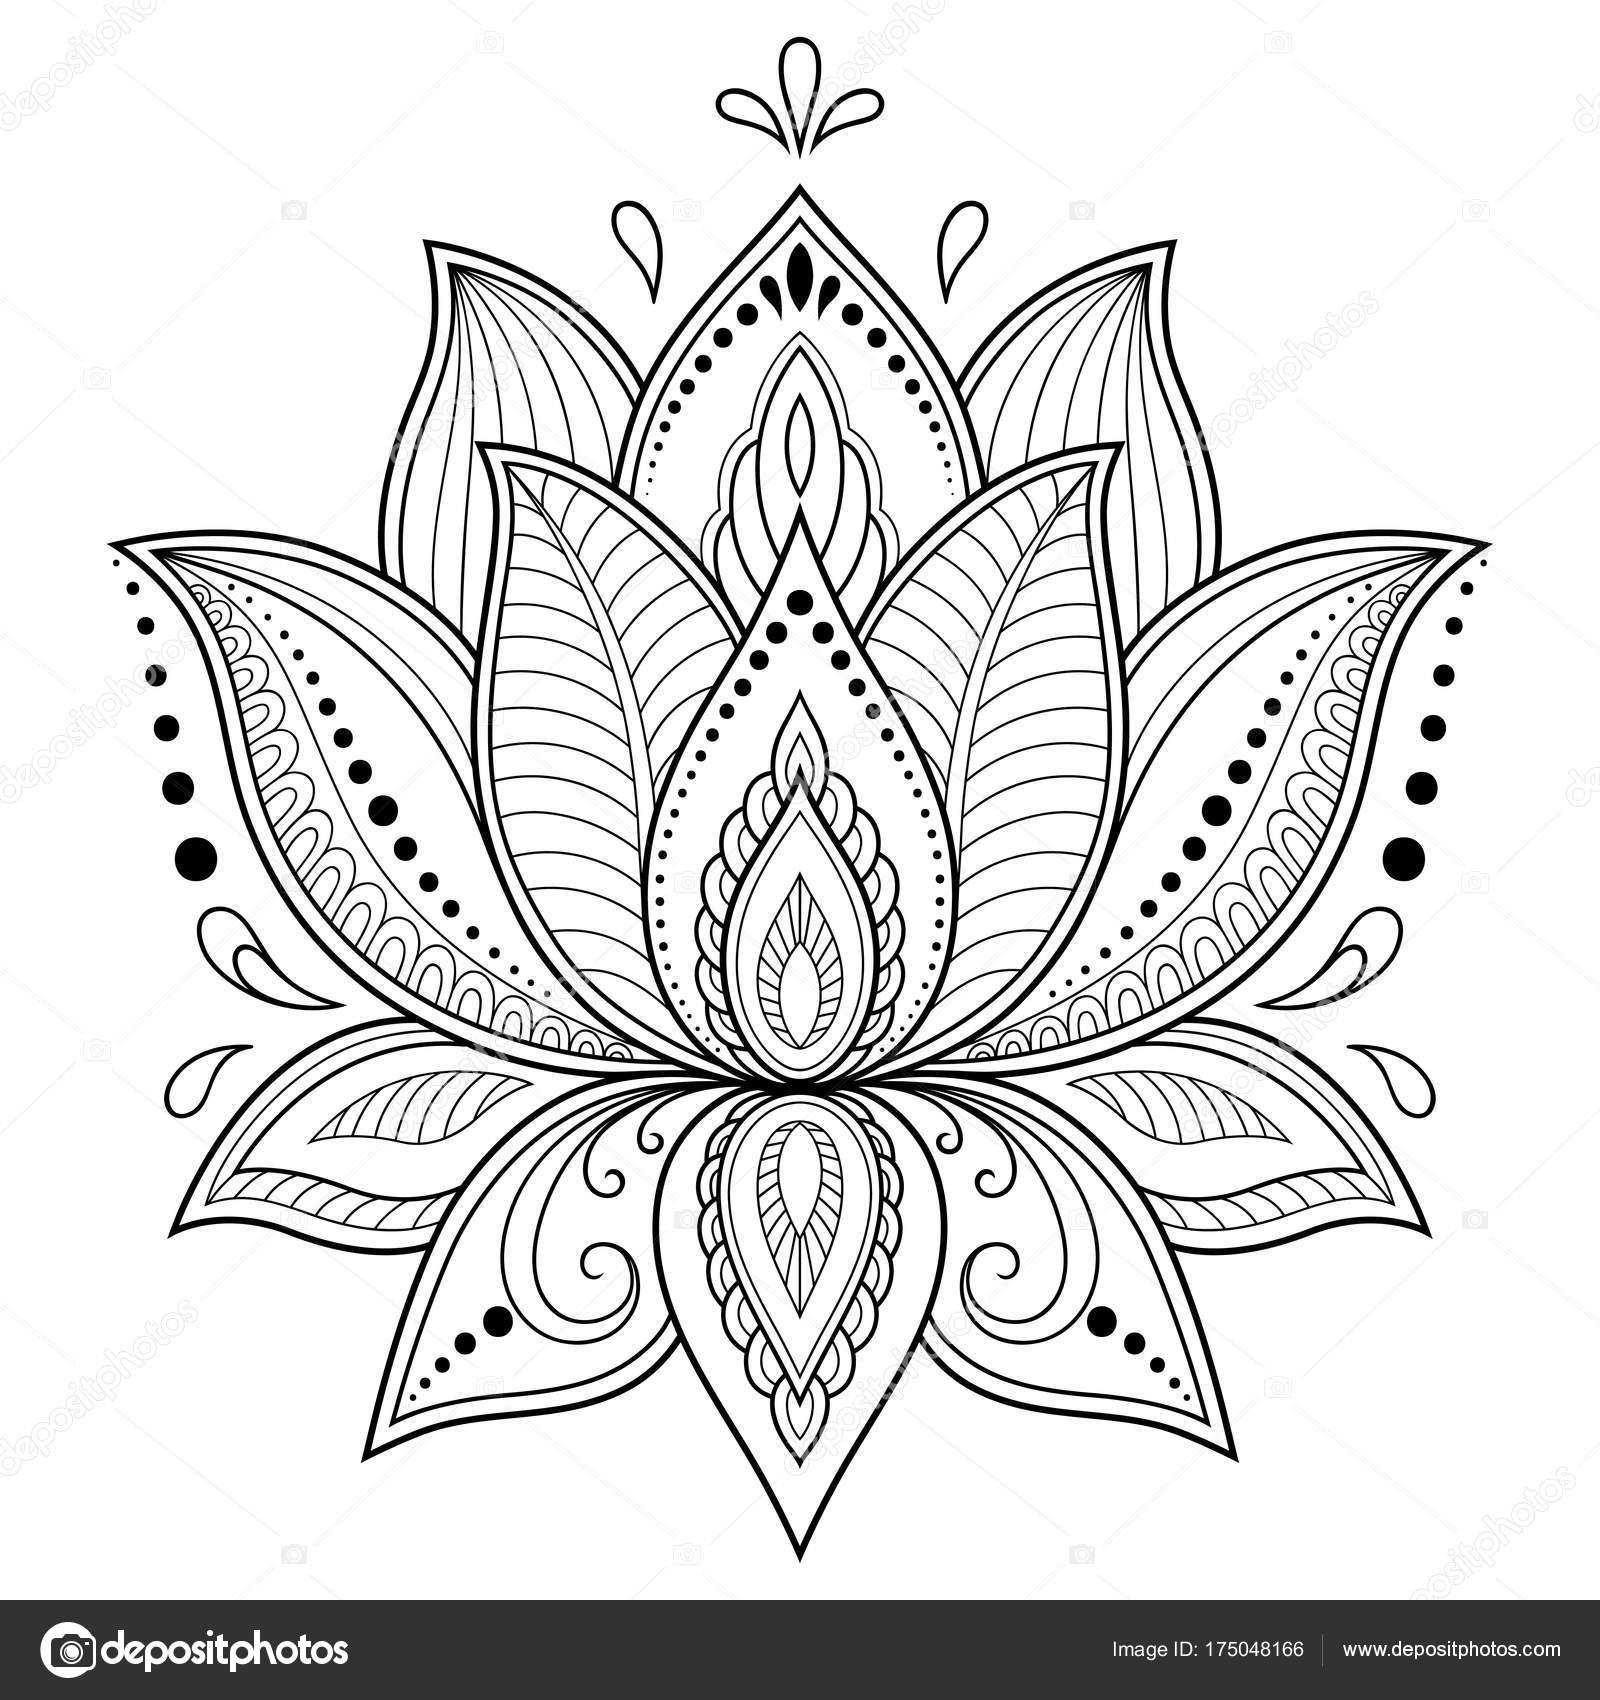 henna tattoo bloem sjabloon indiase stijl etnische floral